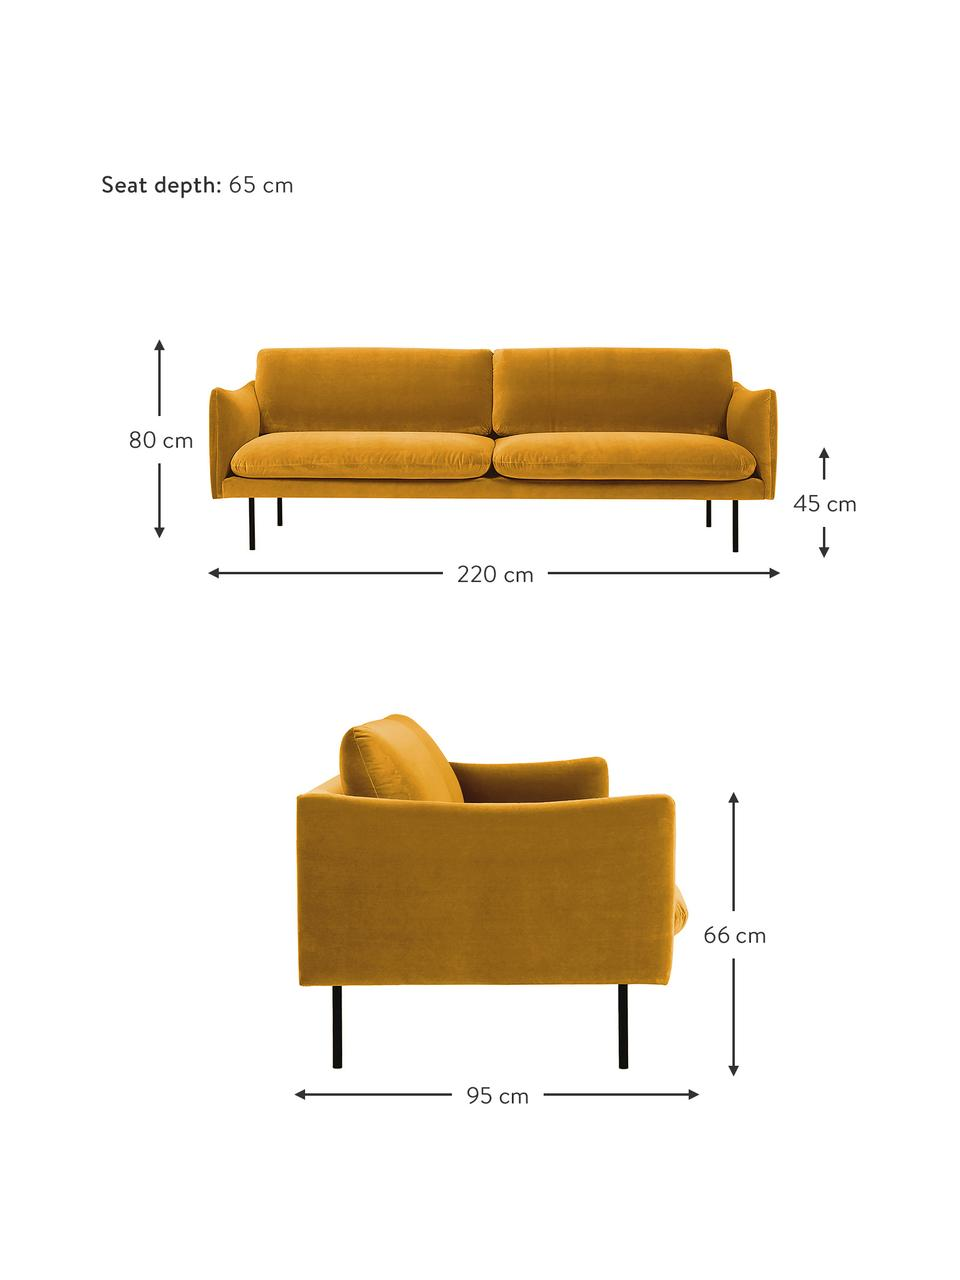 Canapé 3places velours jaune moutarde Moby, Velours jaune moutarde